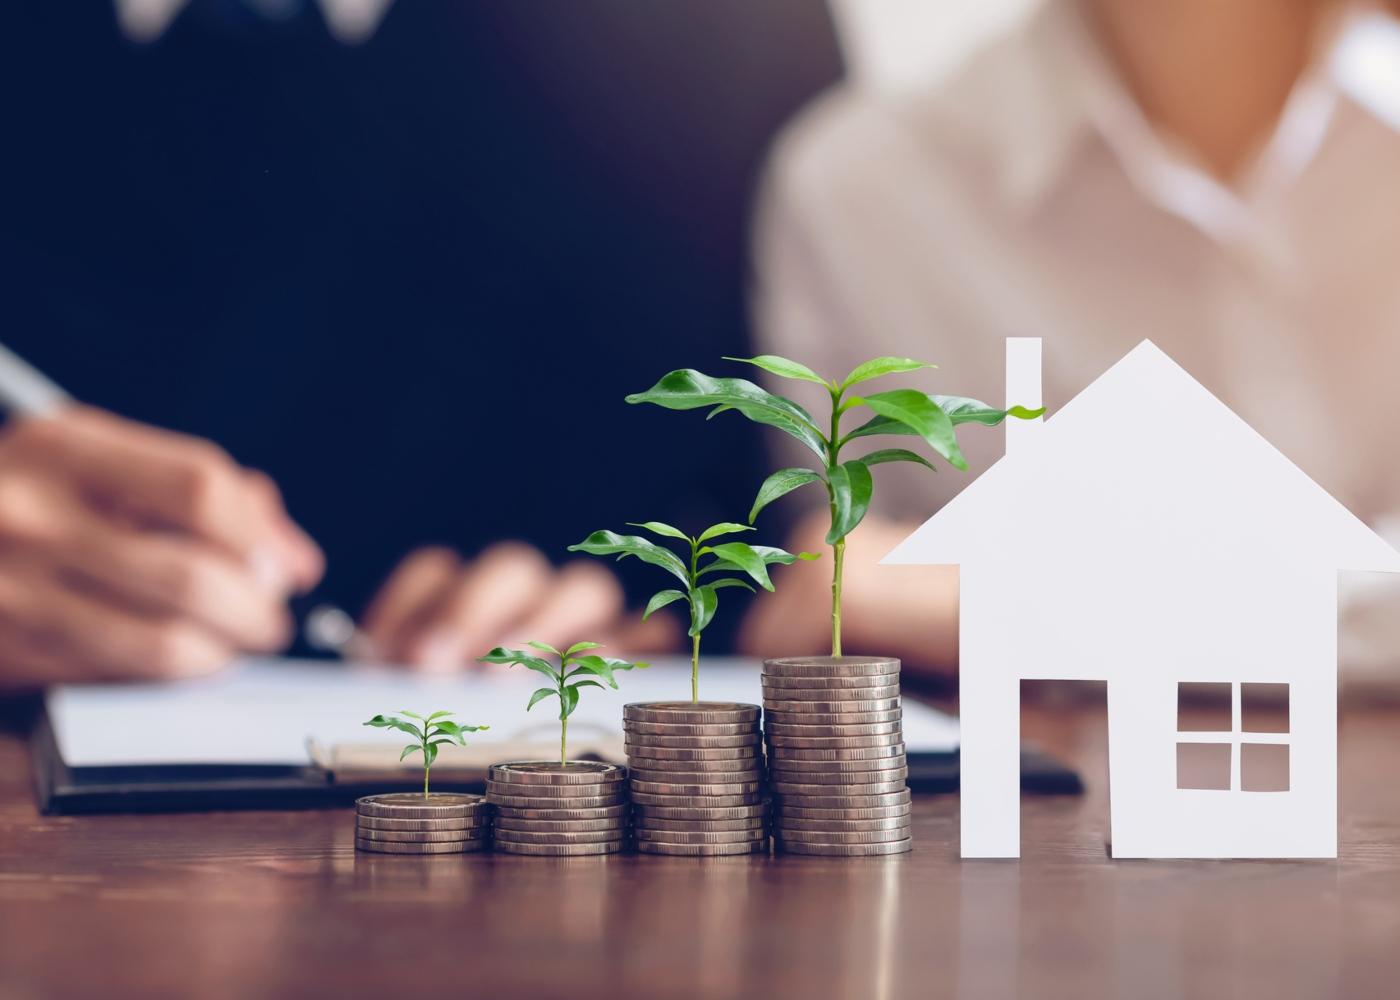 custos de arrendamento de casa